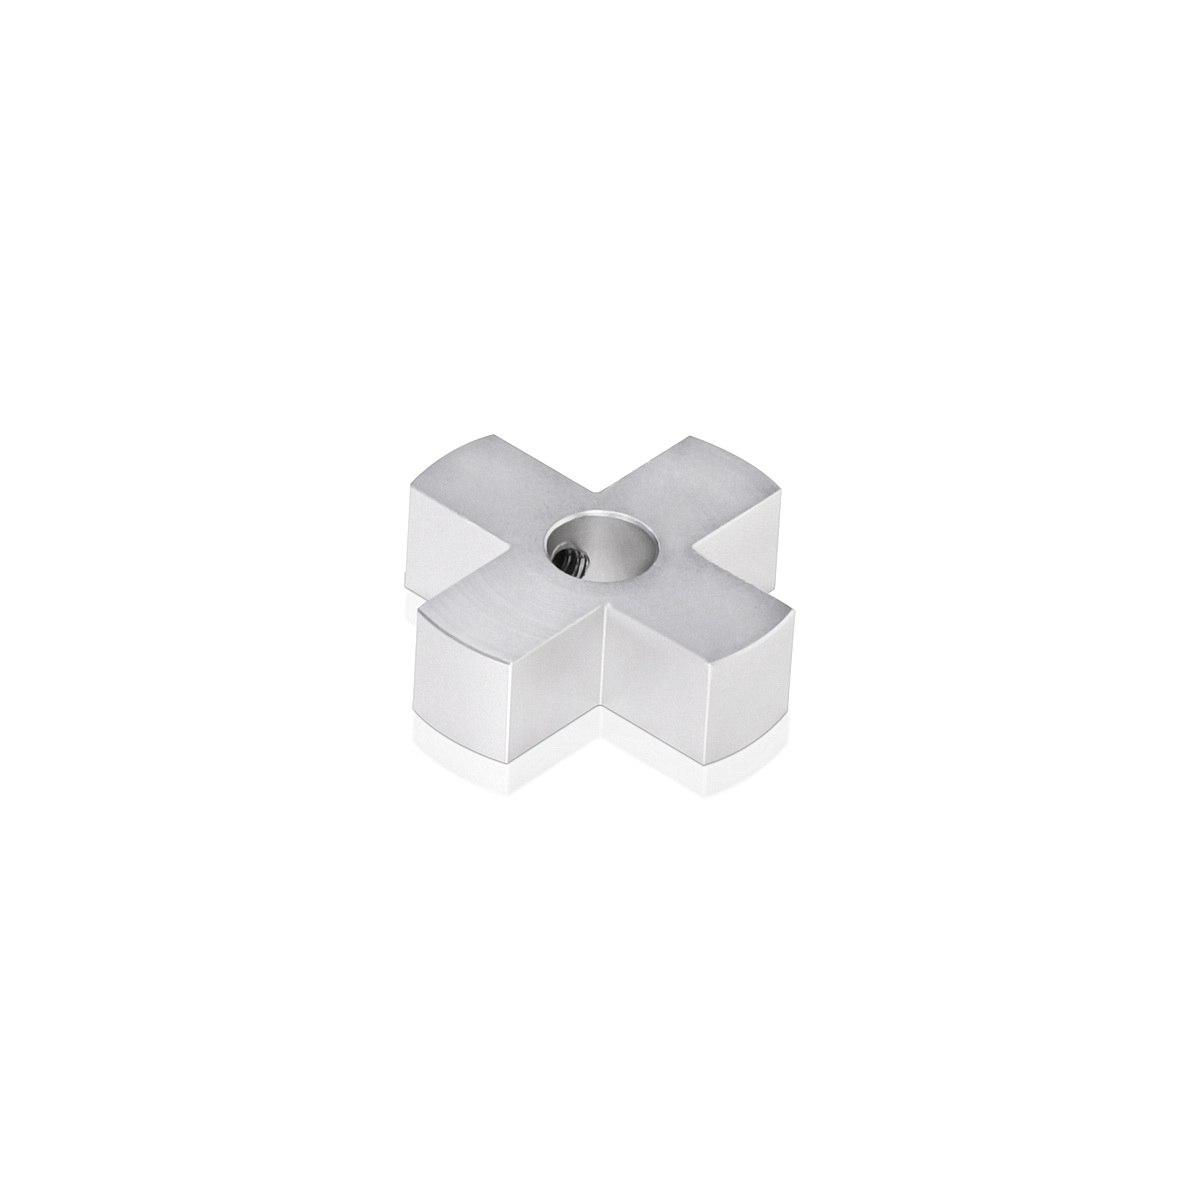 4-Way Standoffs Hub, Diameter: 1 1/4'', Thickness: 3/8'', Clear Anodized Aluminum